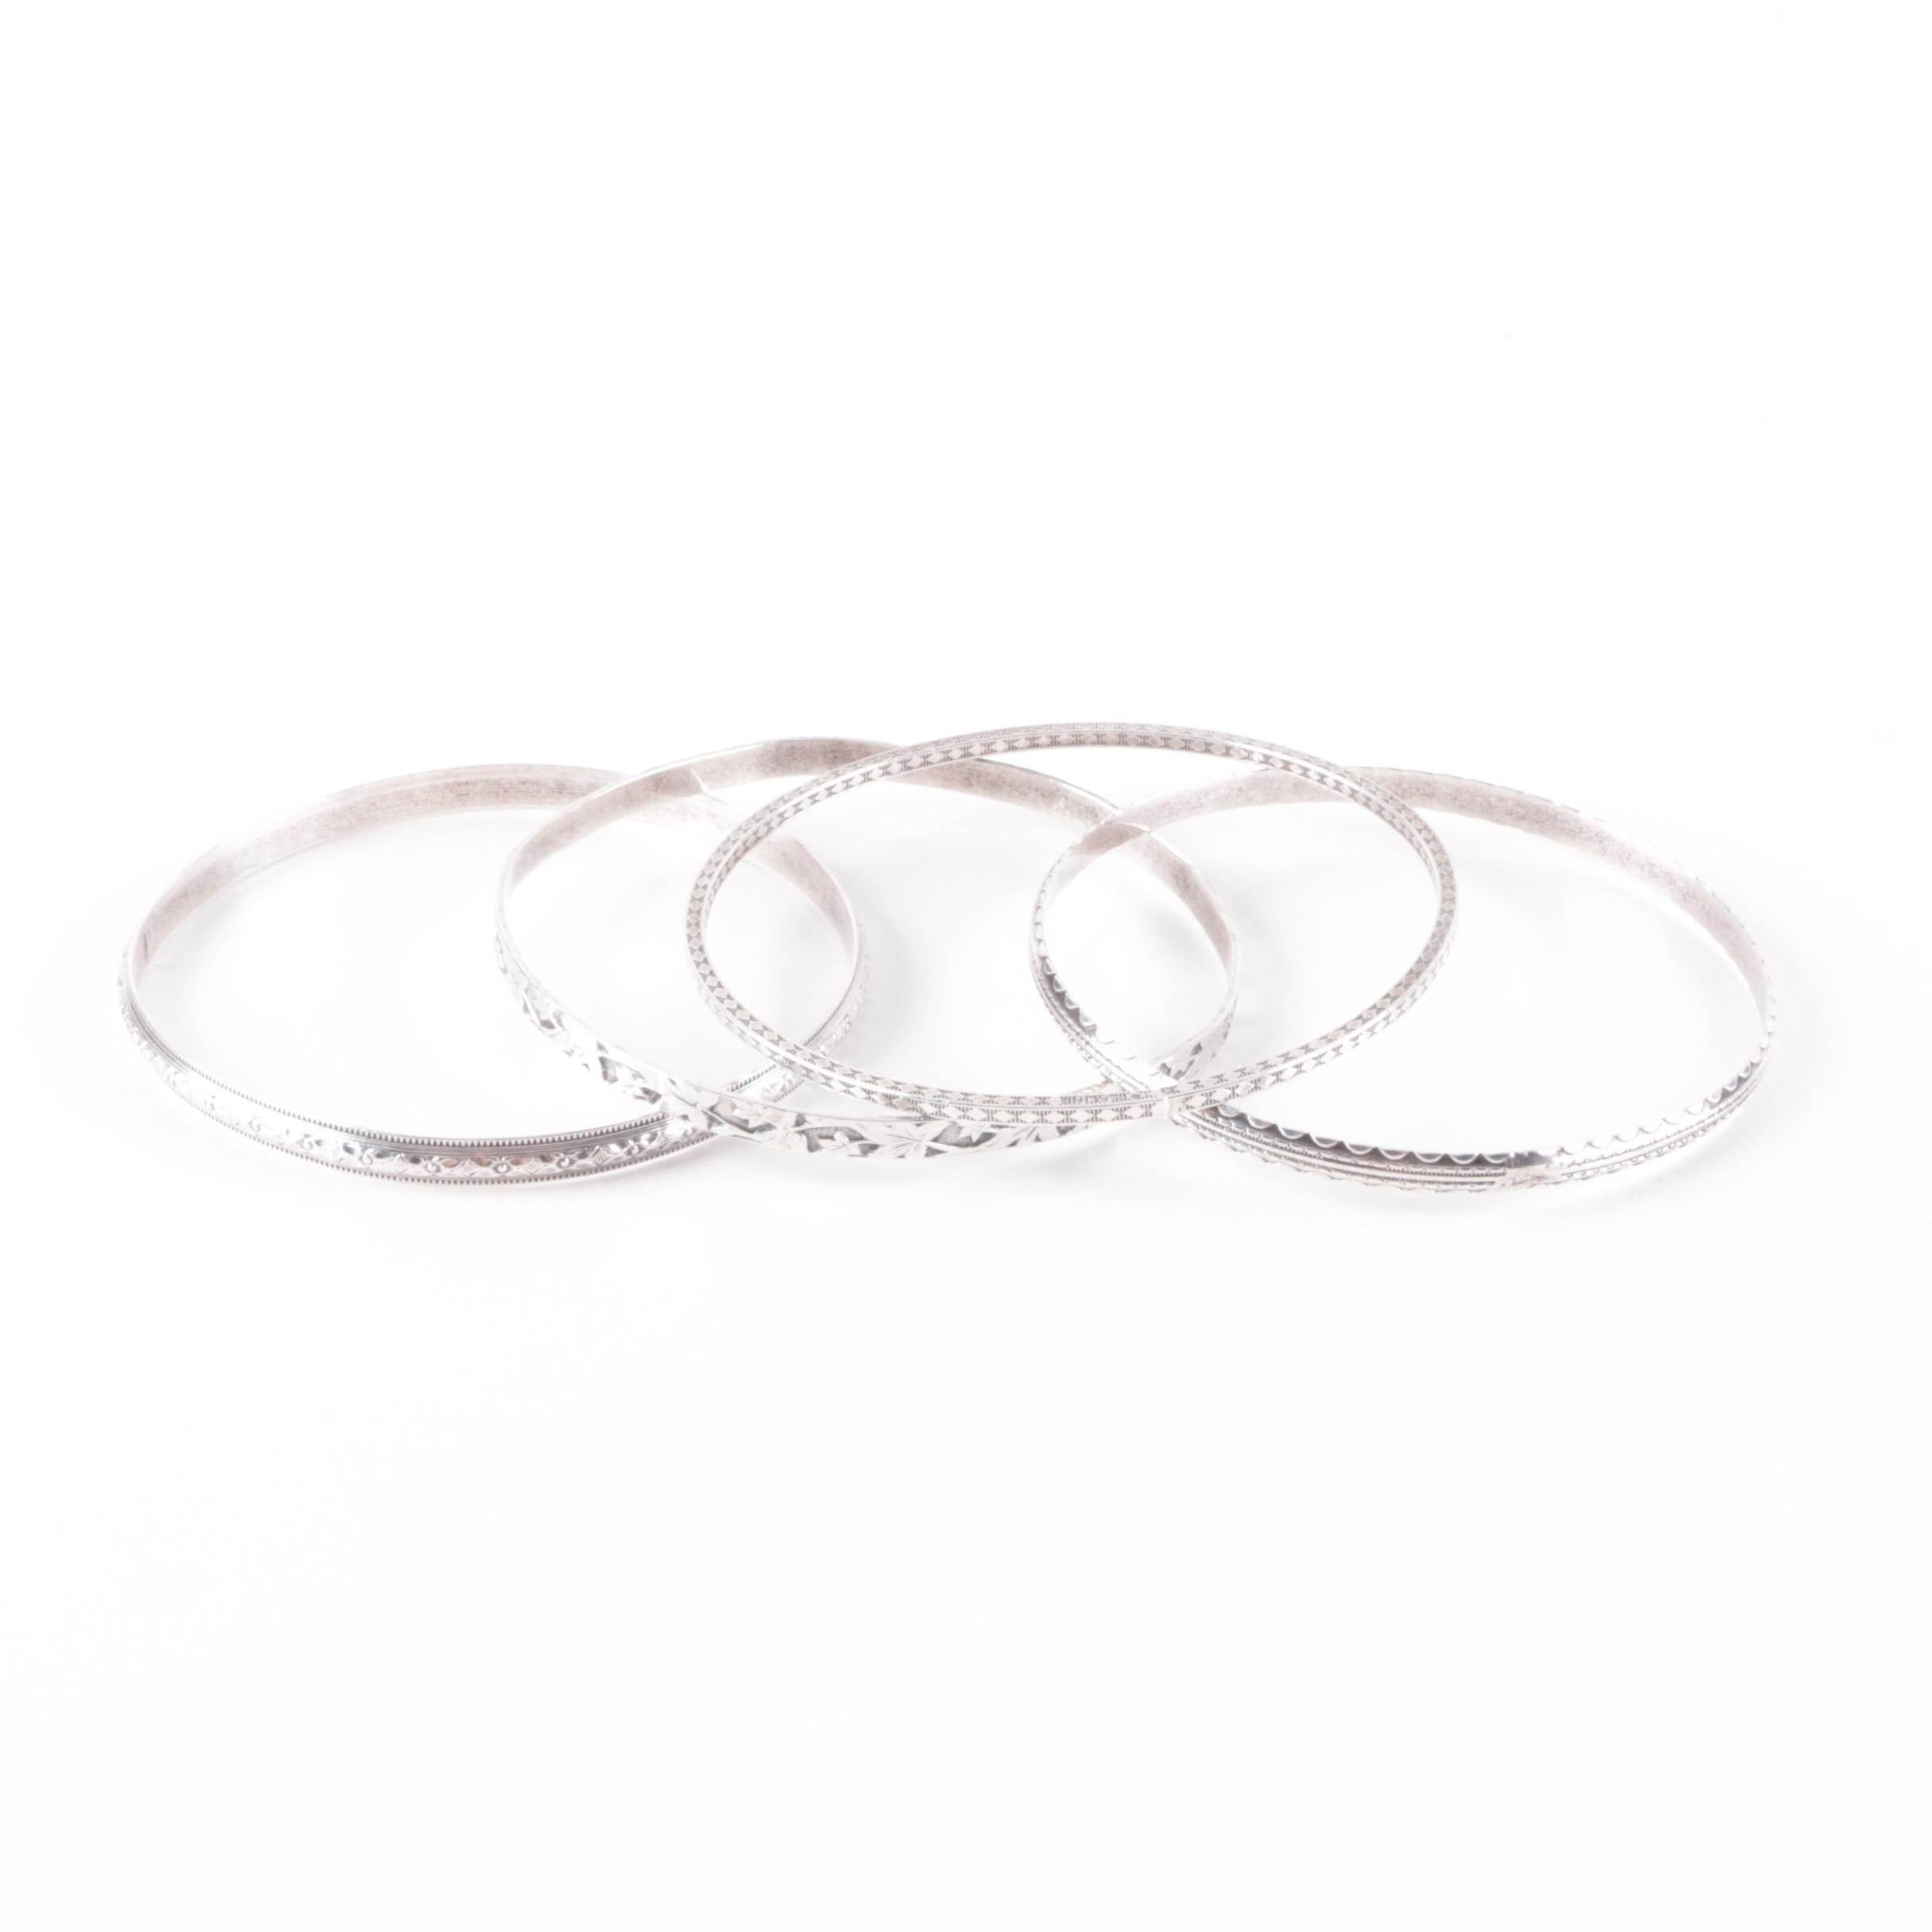 Four Sterling Silver Etched Bangle Bracelets